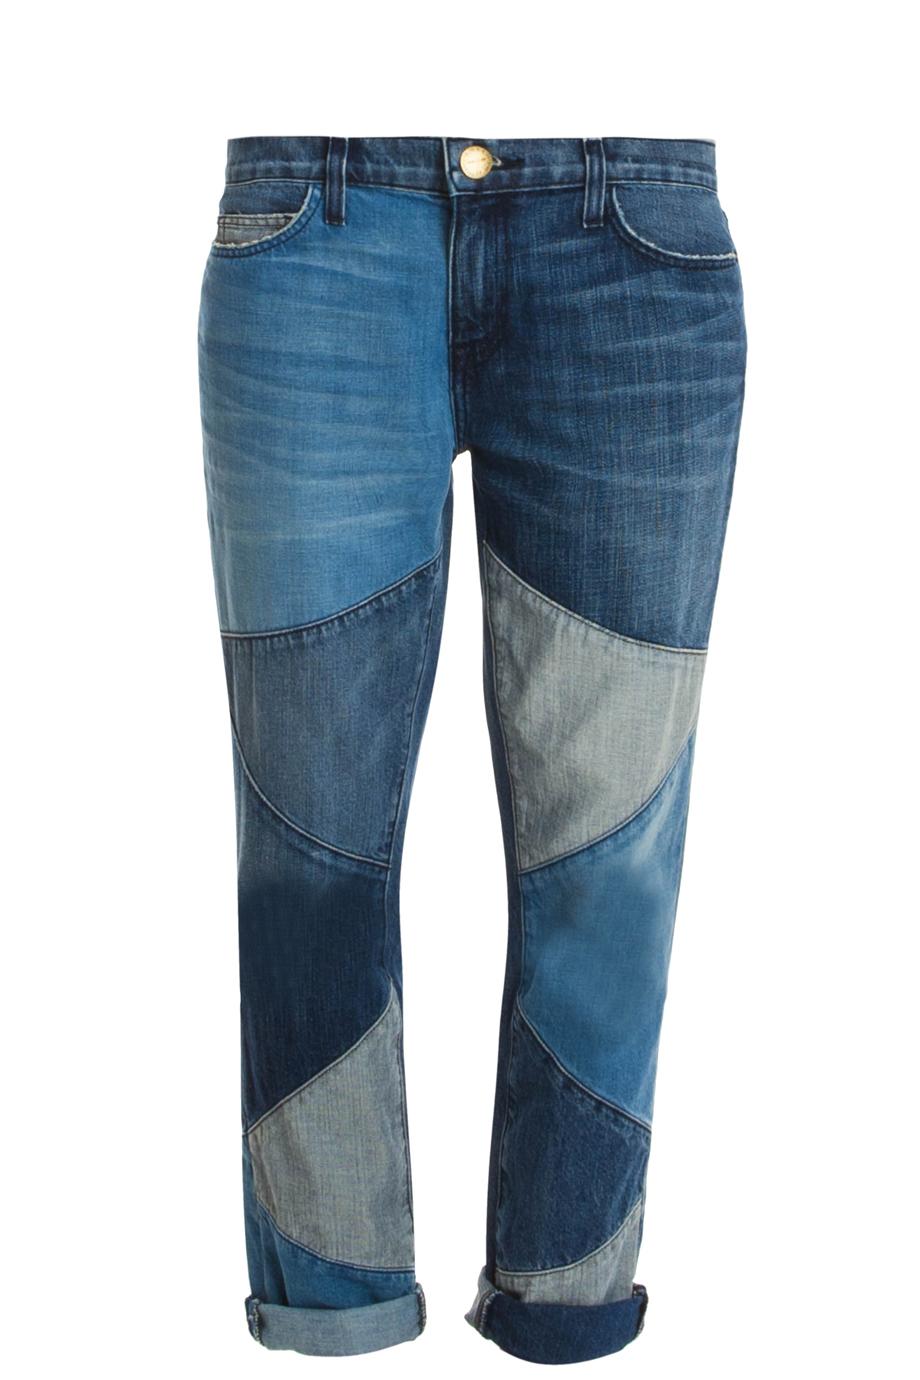 Current/Elliott Stiletto Patchwork Jeans SHOPBOP